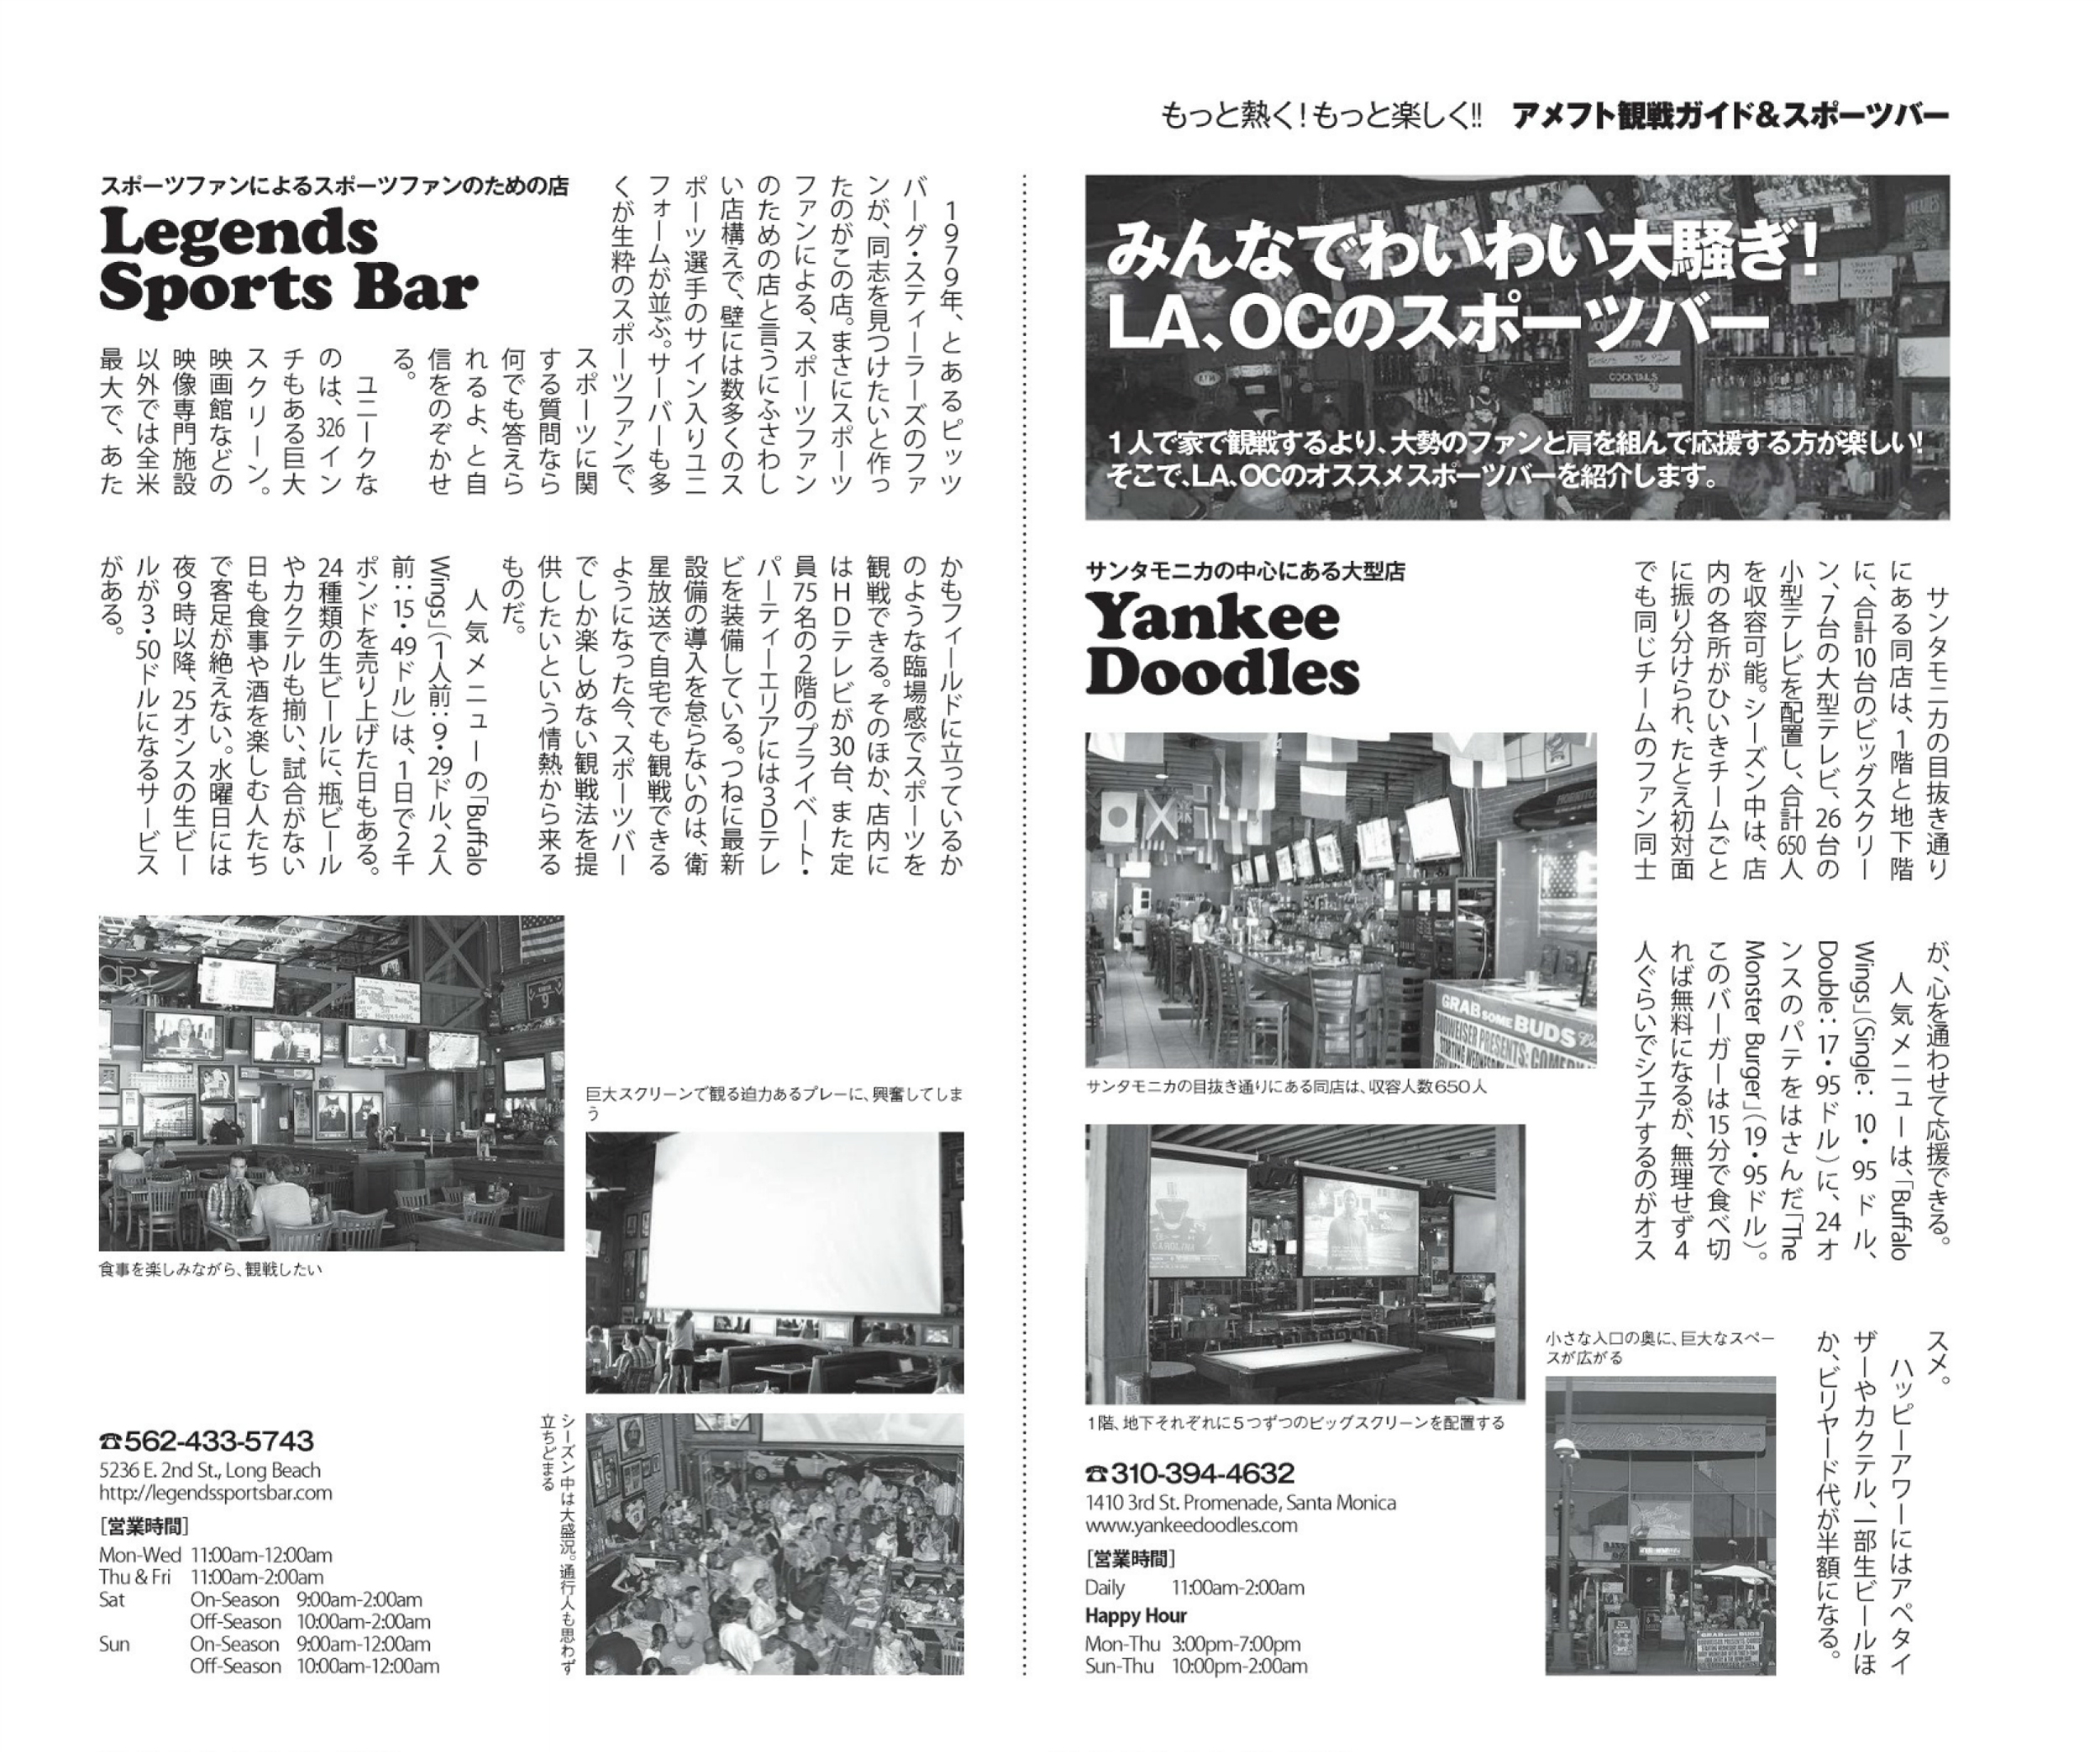 Lighthouse LA August 16, 2011 Page-1-4.jpg